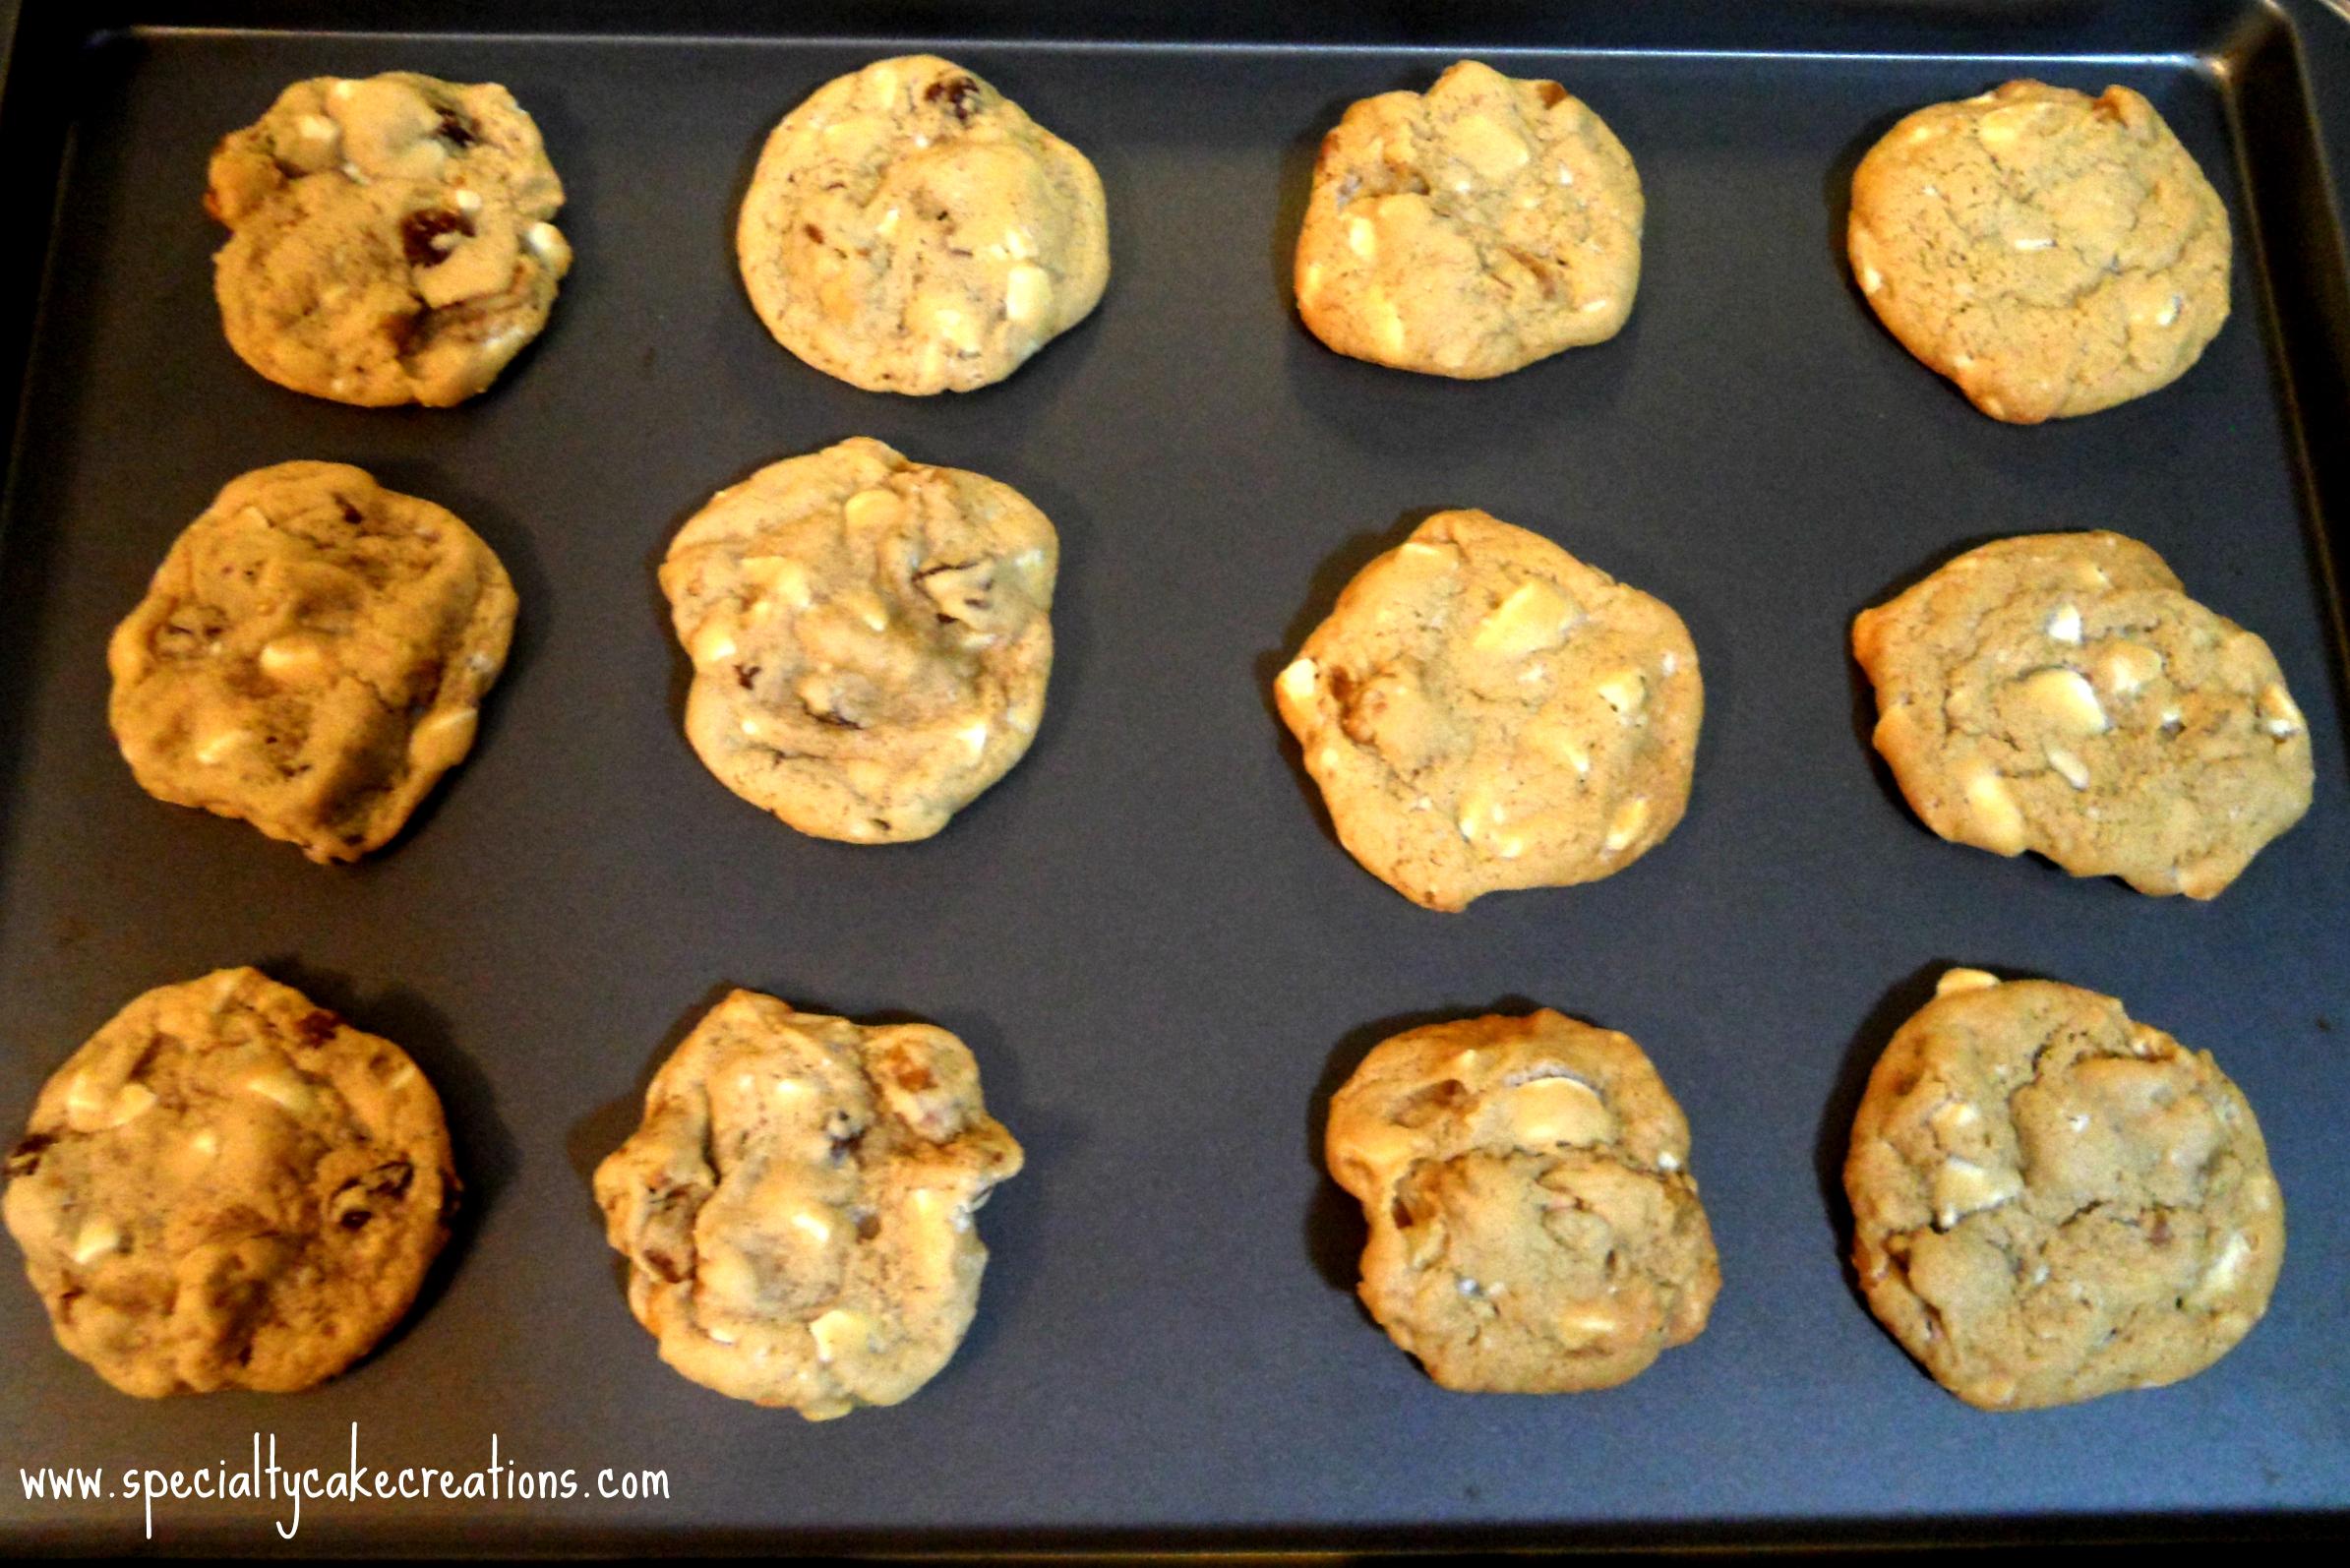 Maple Walnut Cookies on Tray